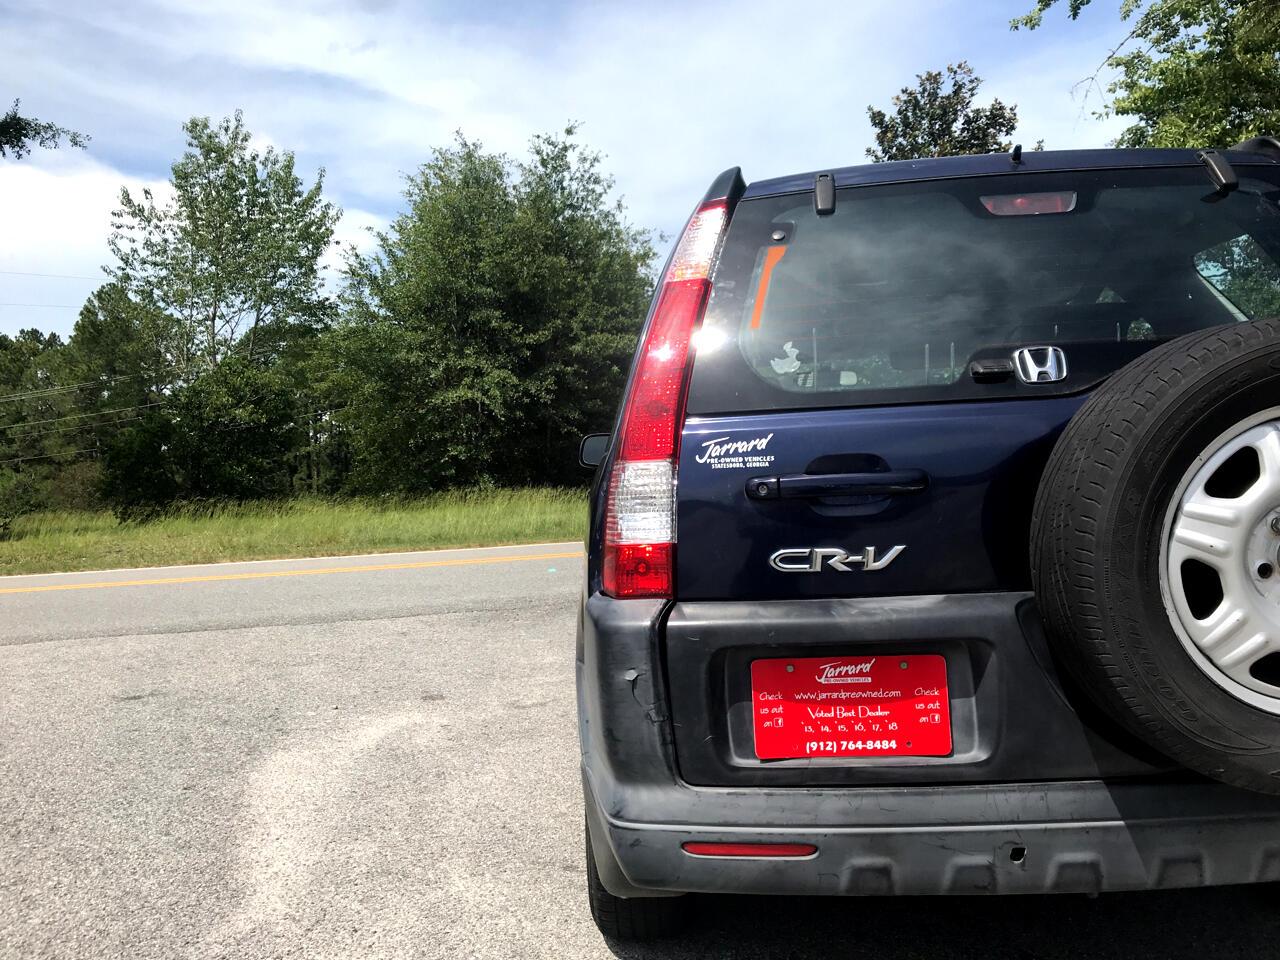 2006 Honda CR-V 2WD LX AT